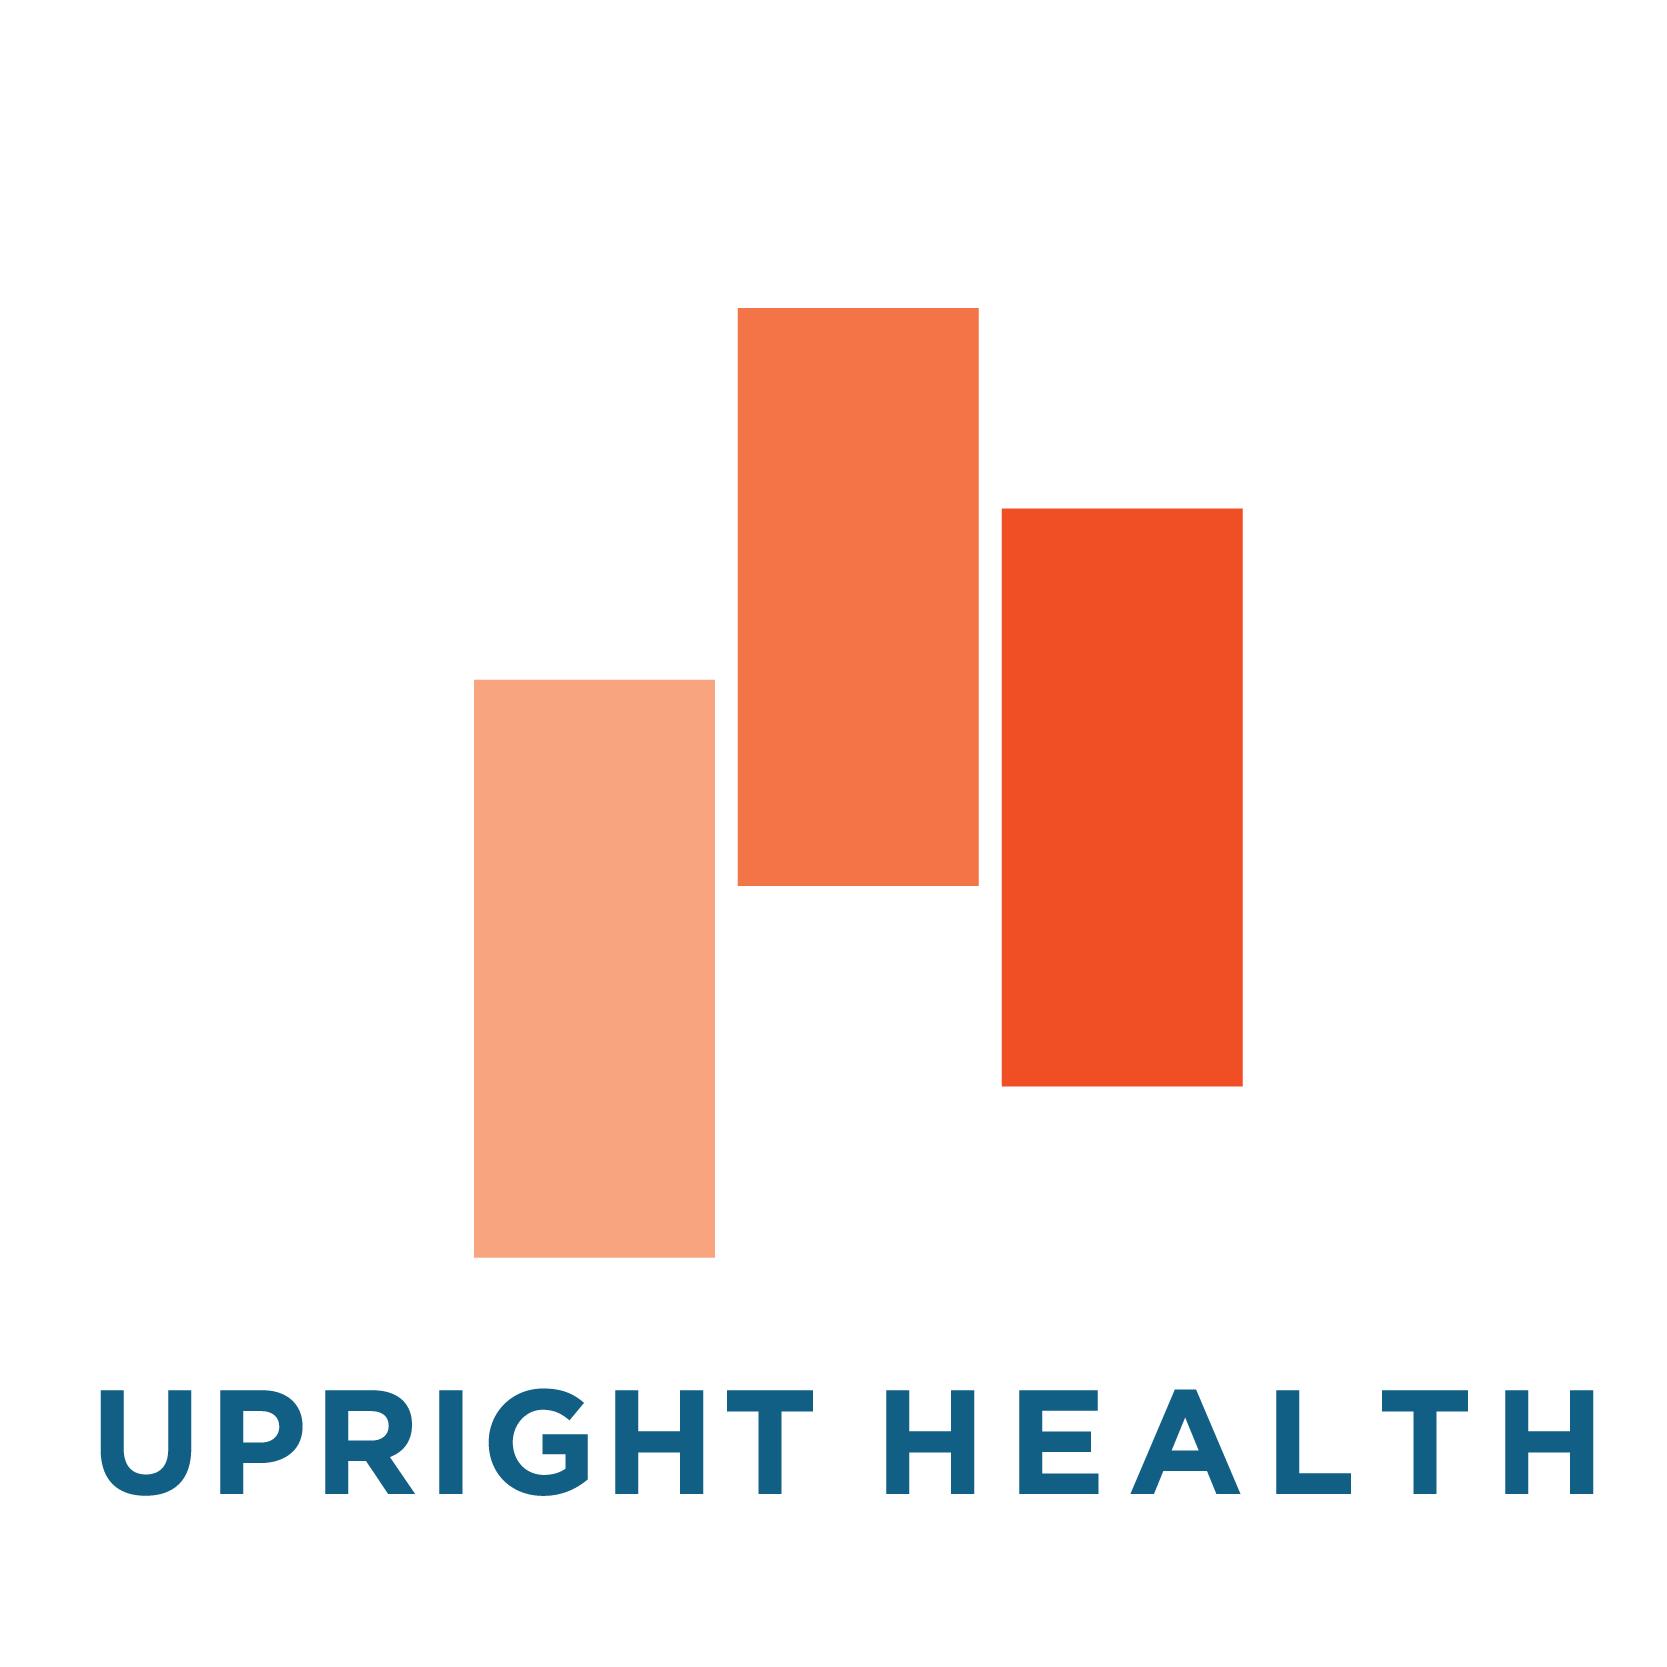 Upright Health